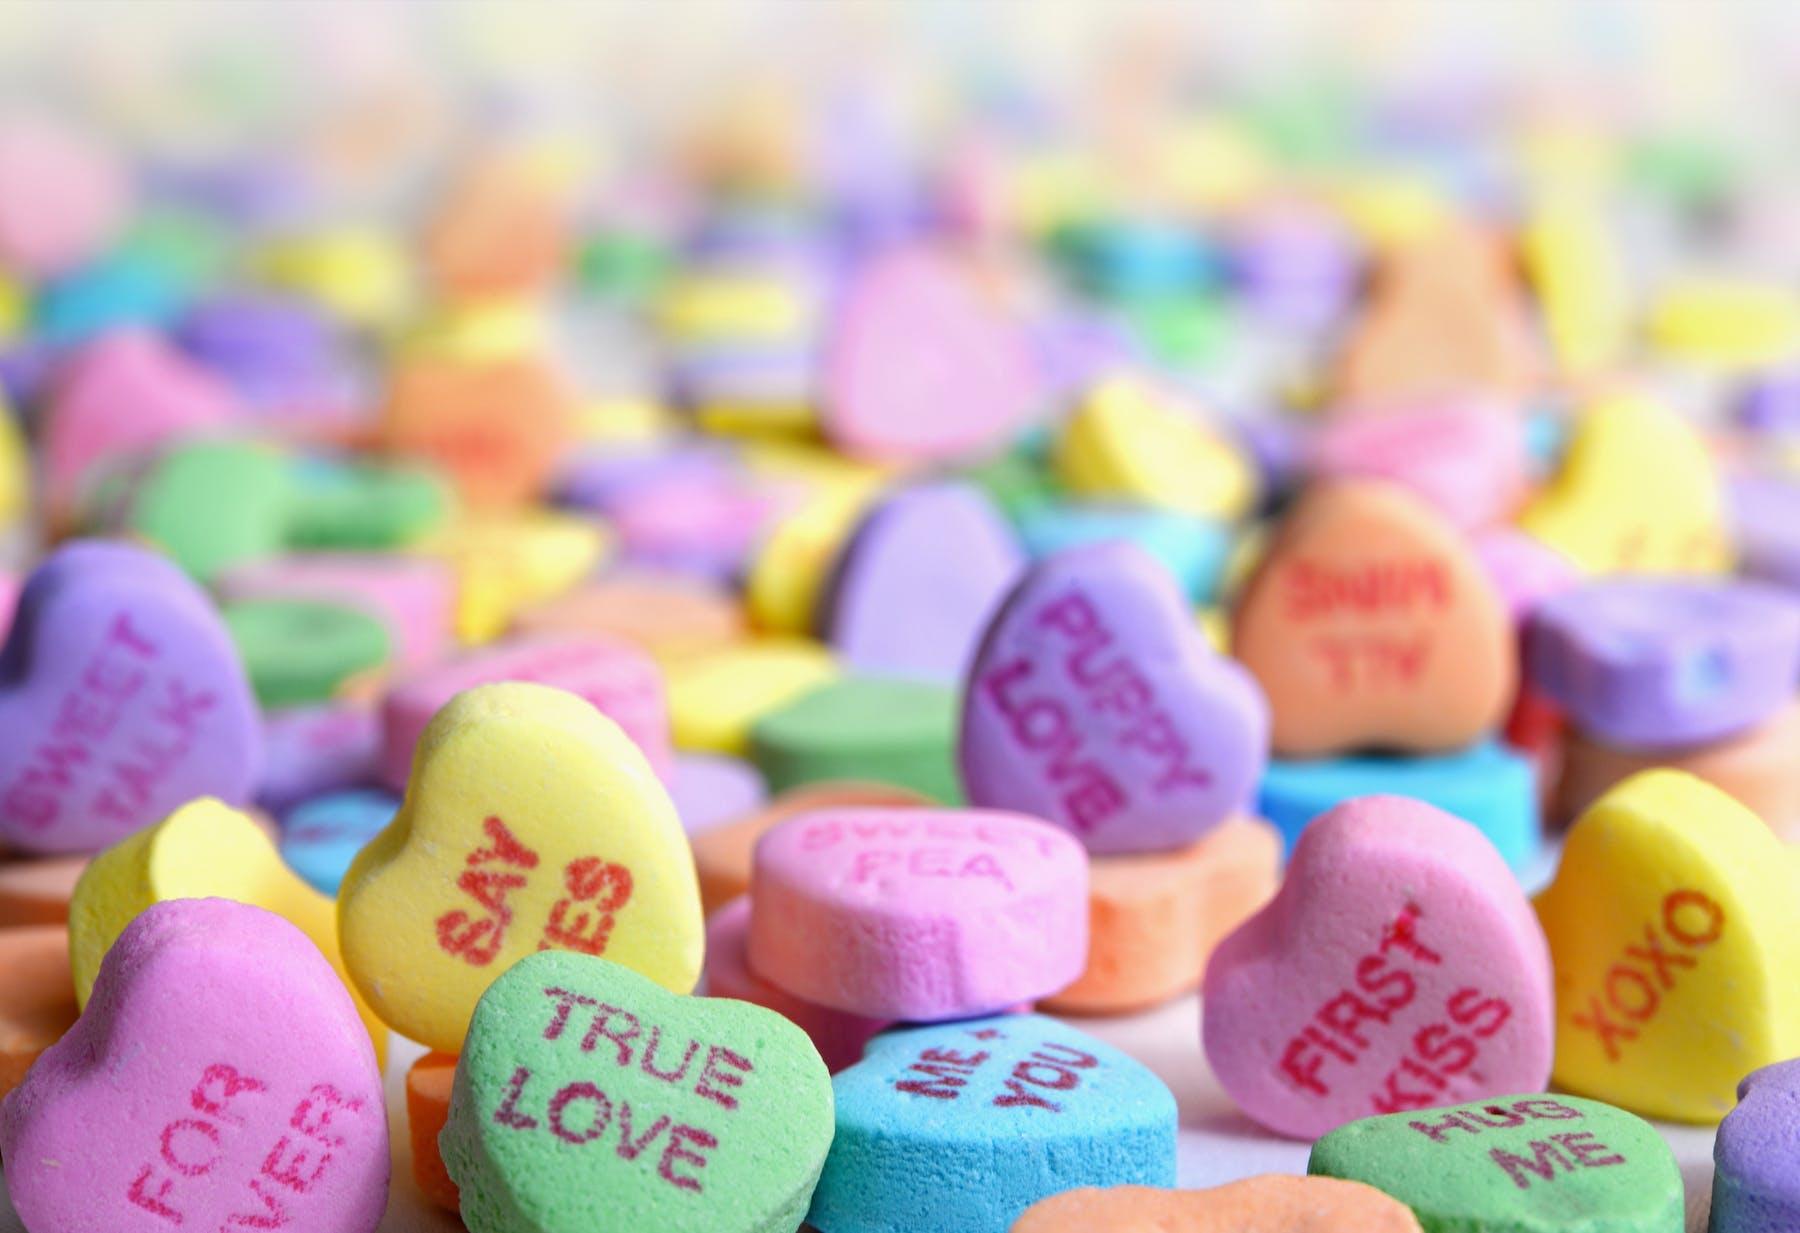 heart candies